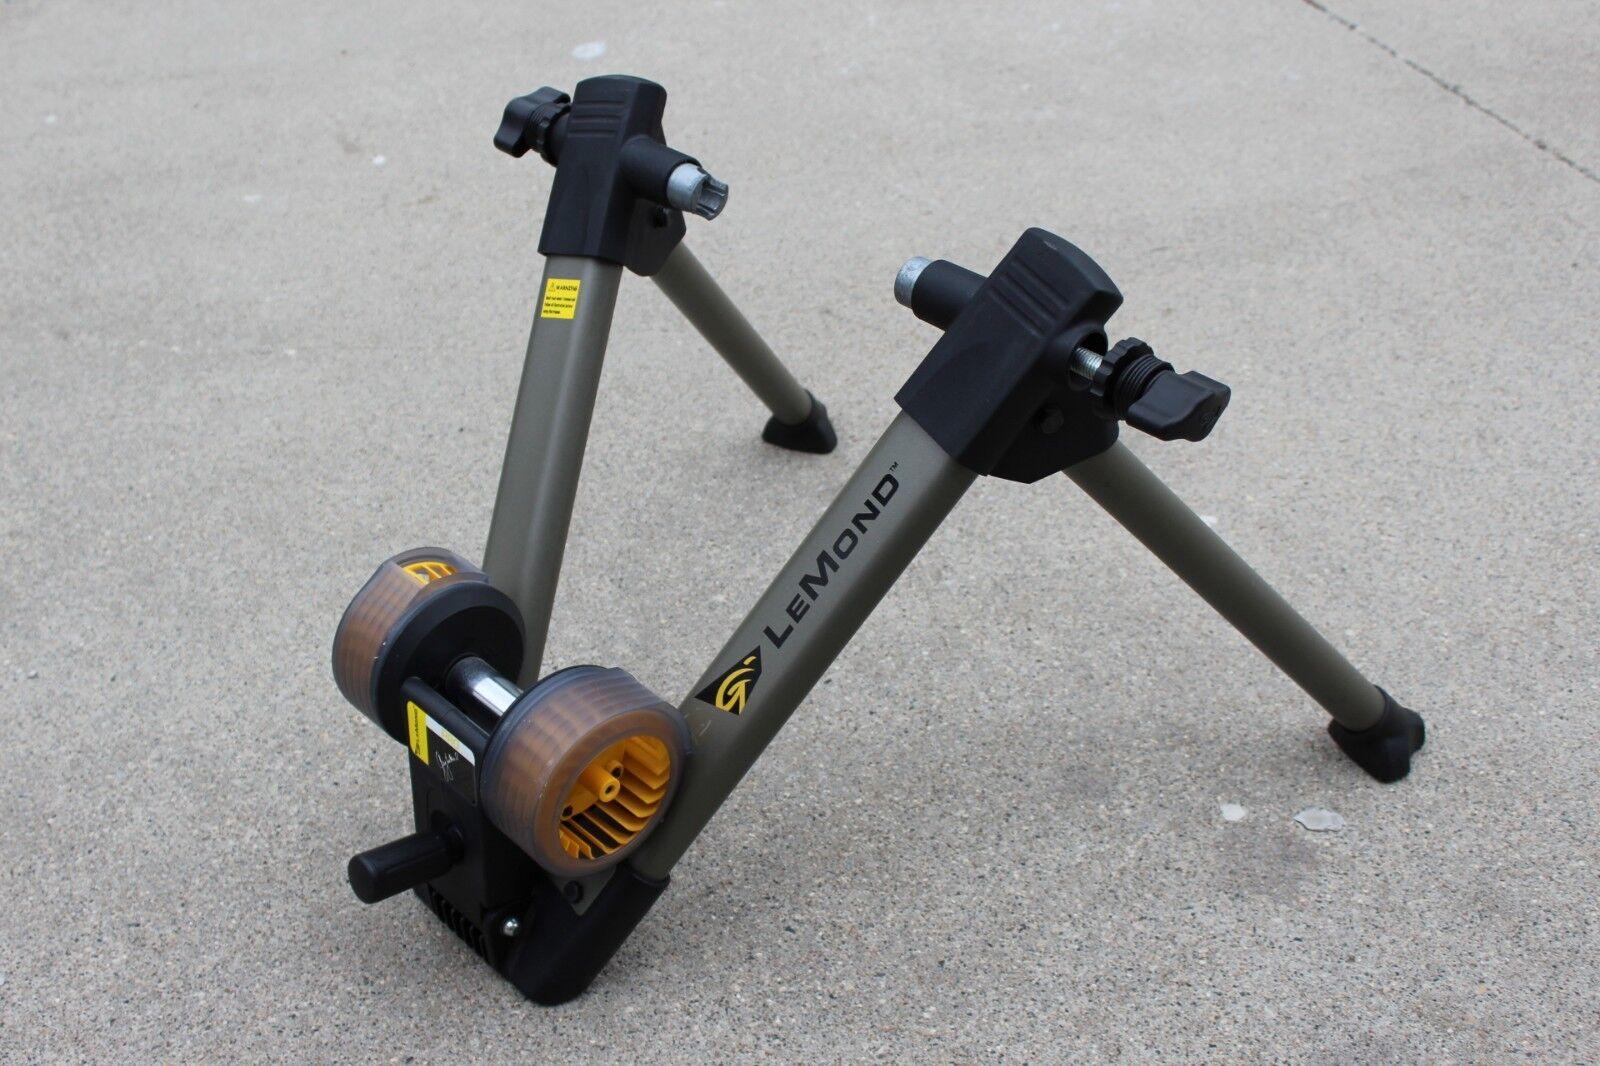 Greg LeMond Wind Pro Trainer estacionario Fitness Soporte Bicicleta de Montaña Bici Bicicleta